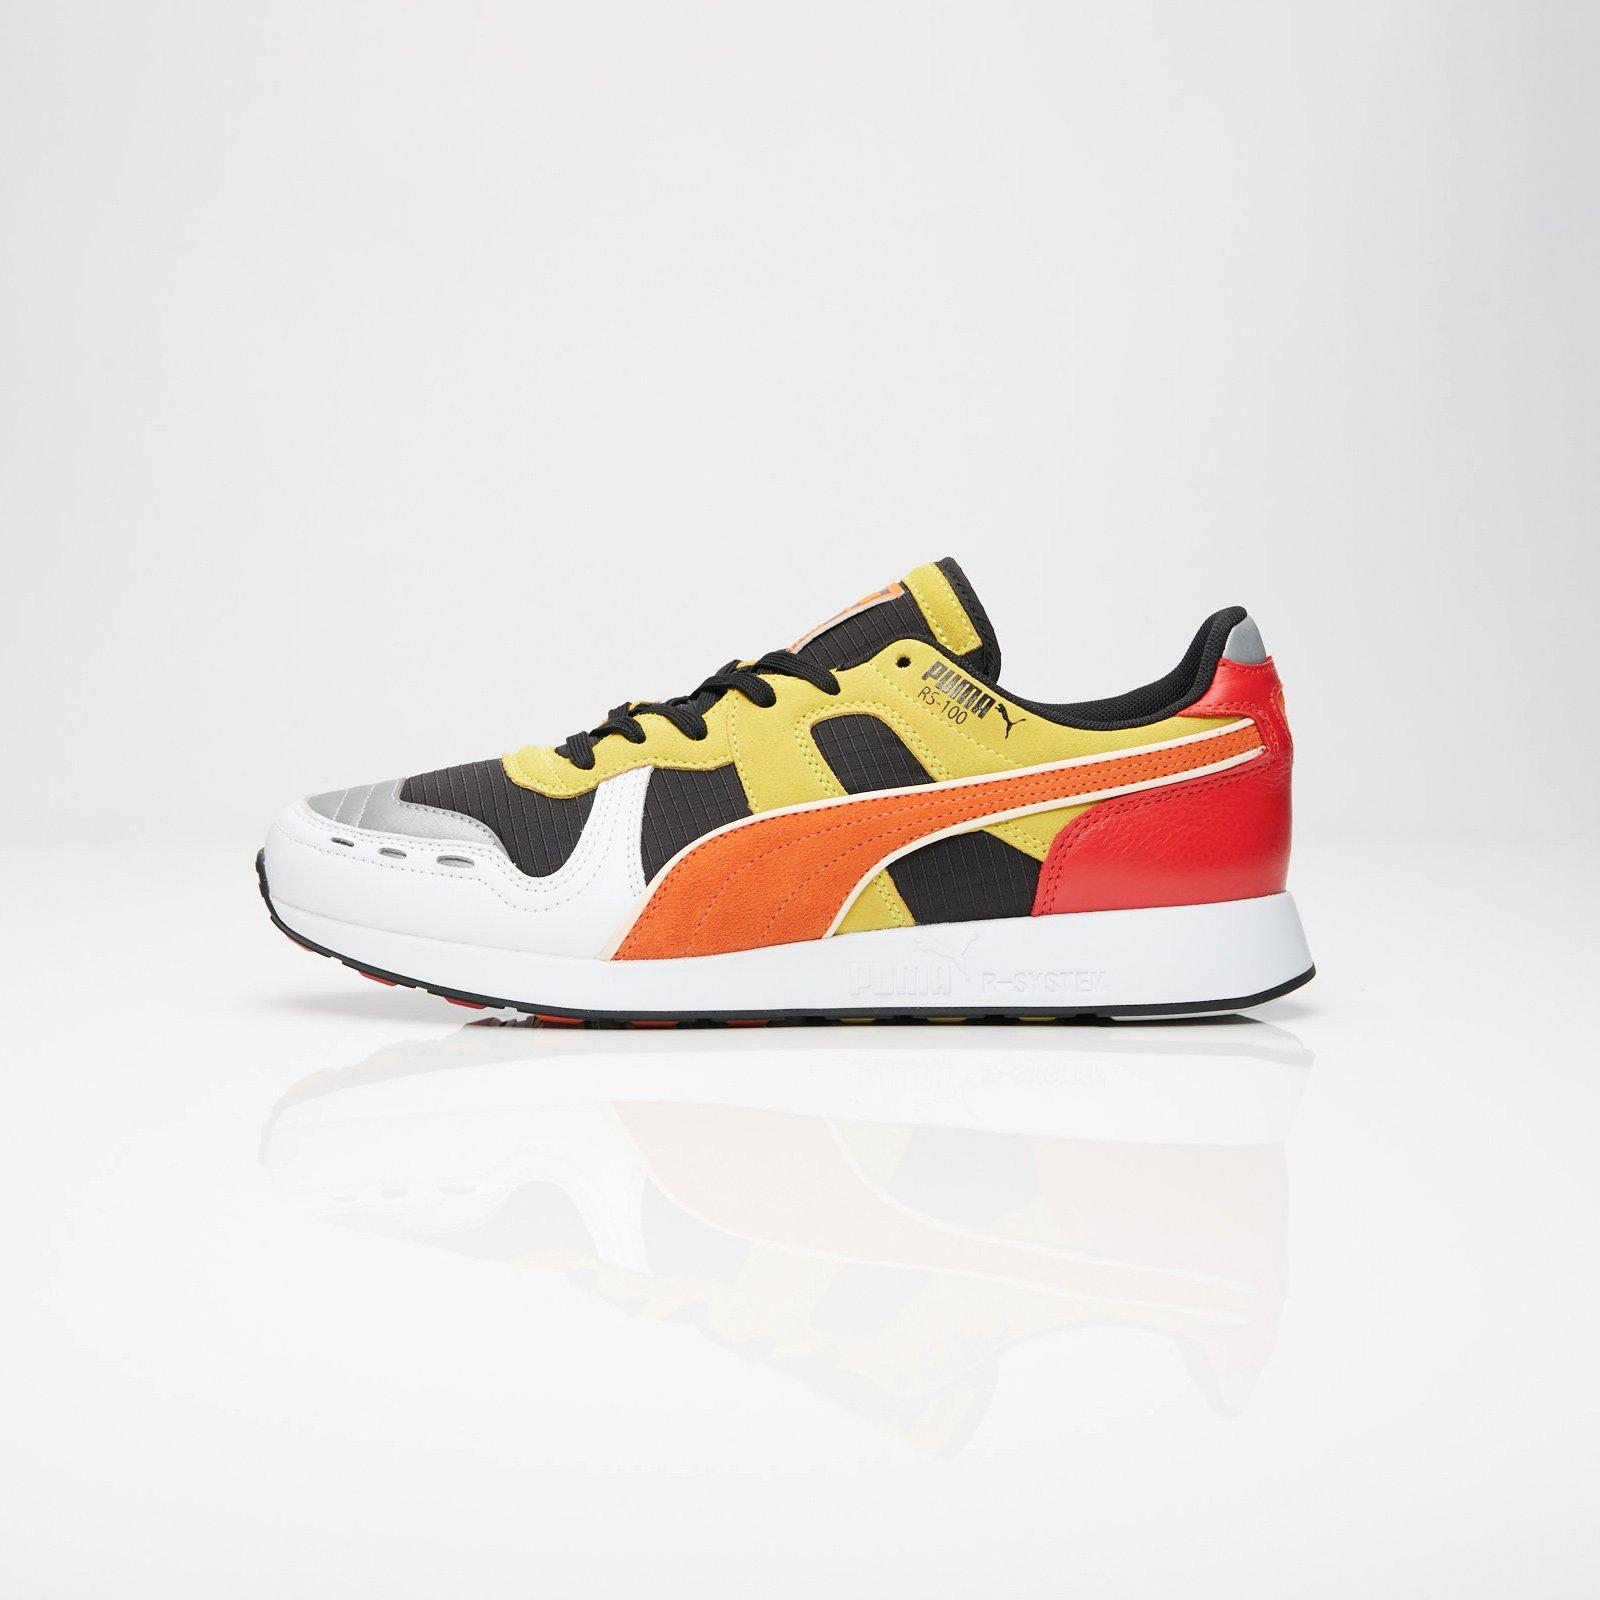 Puma RS 100 x Roland 368405 01 Sneakersnstuff sneakers  sneakers